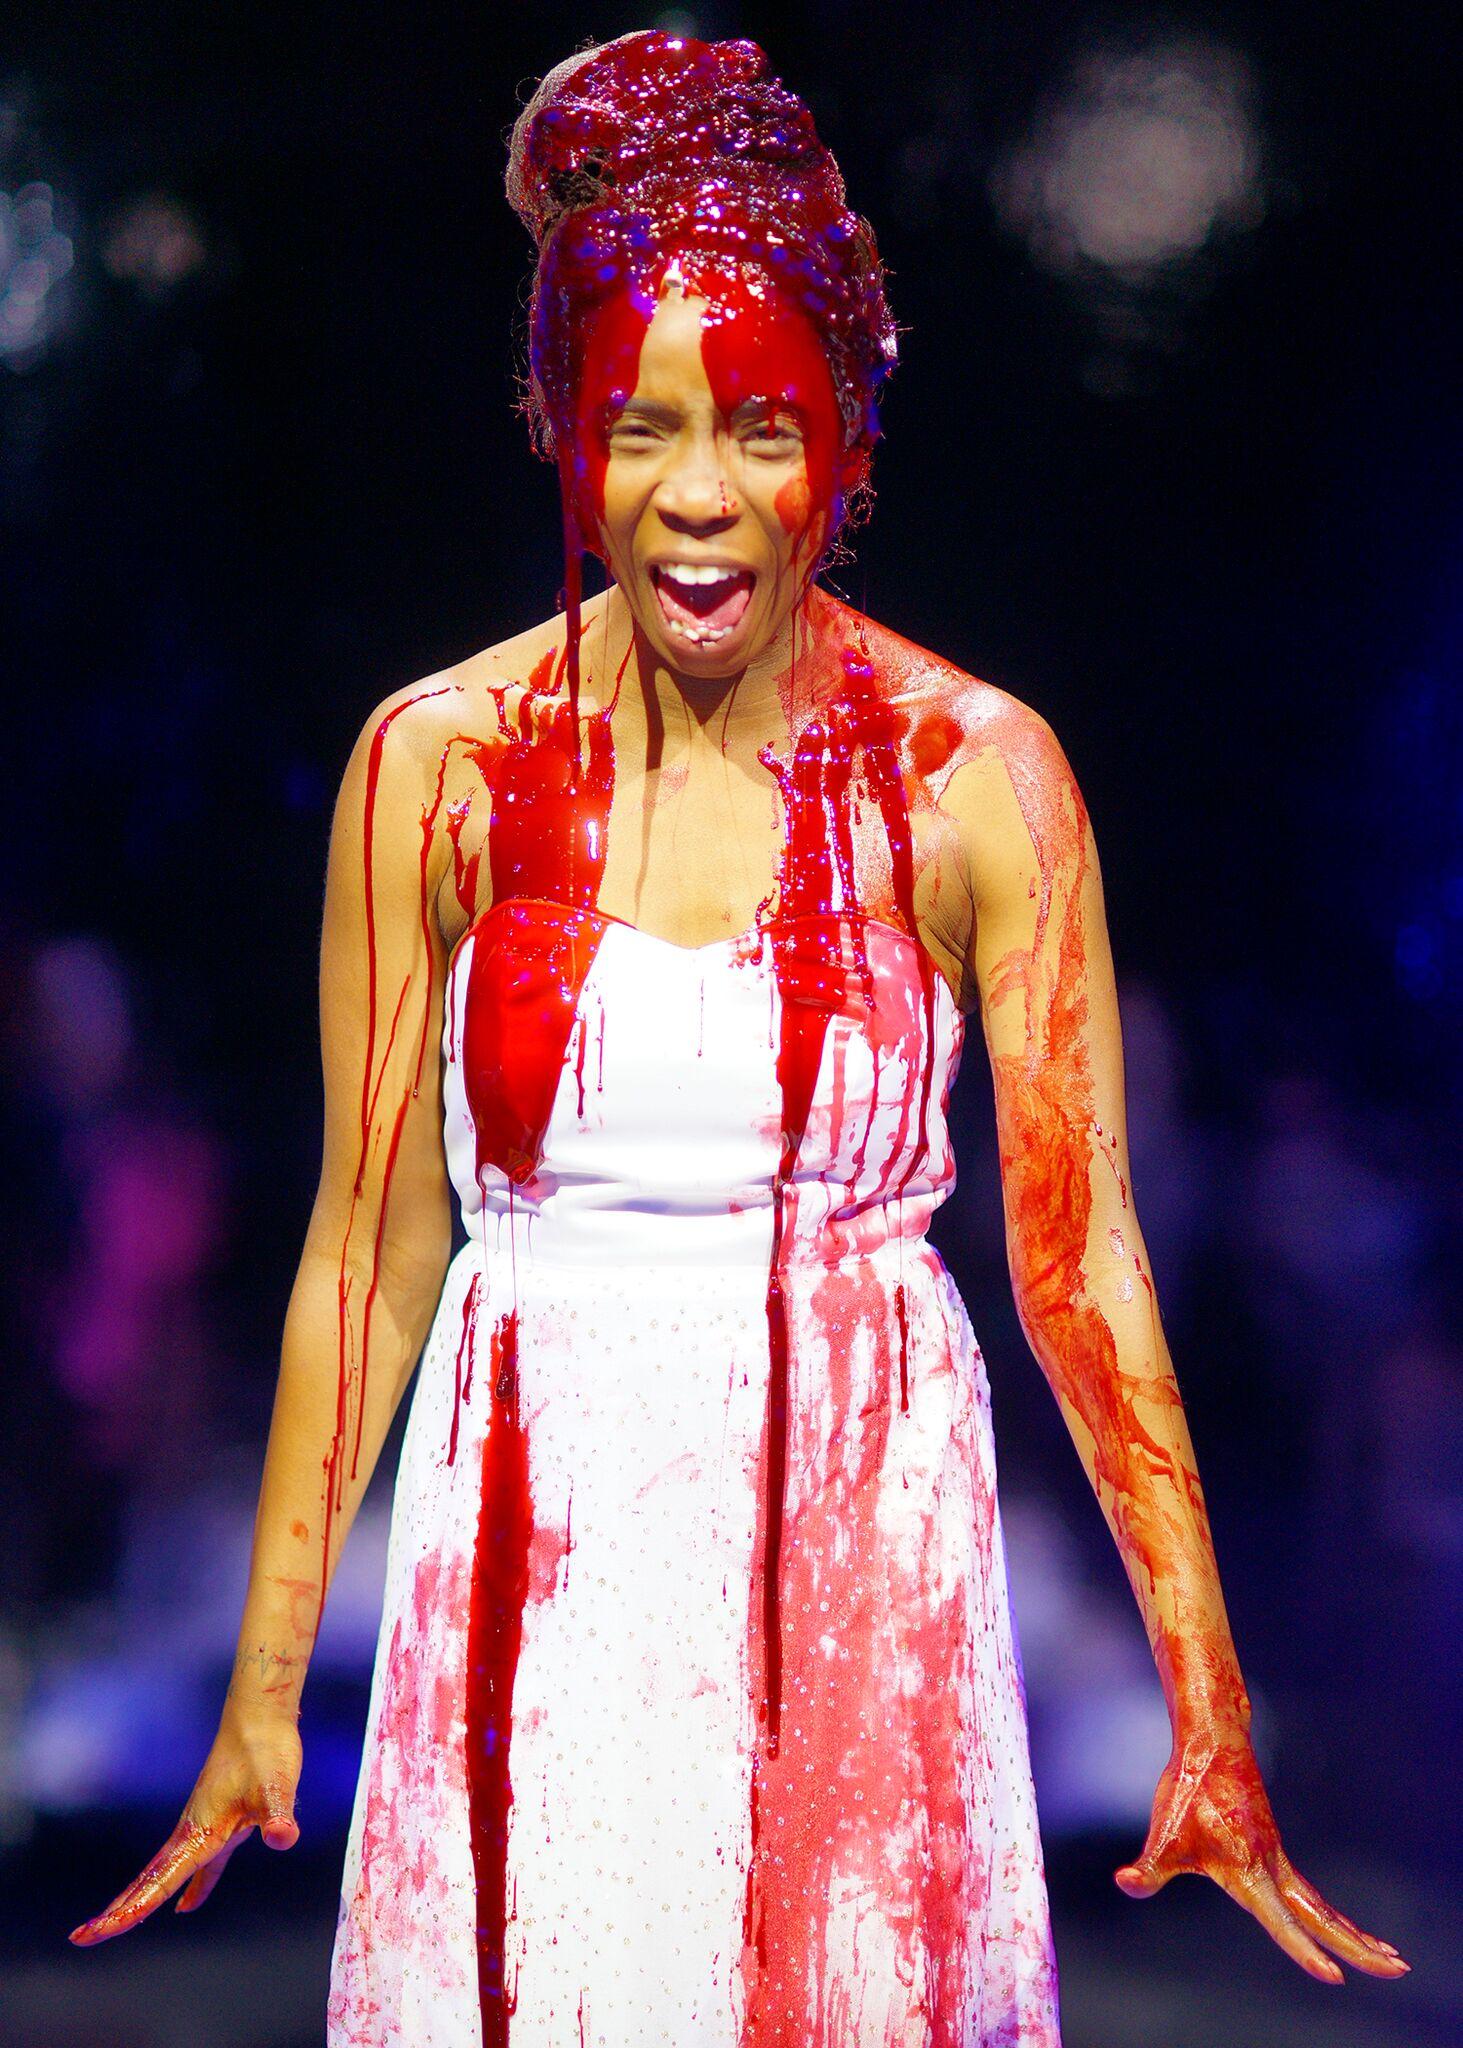 Blood, Broken Bones, Telekinesis: That Song and Dance